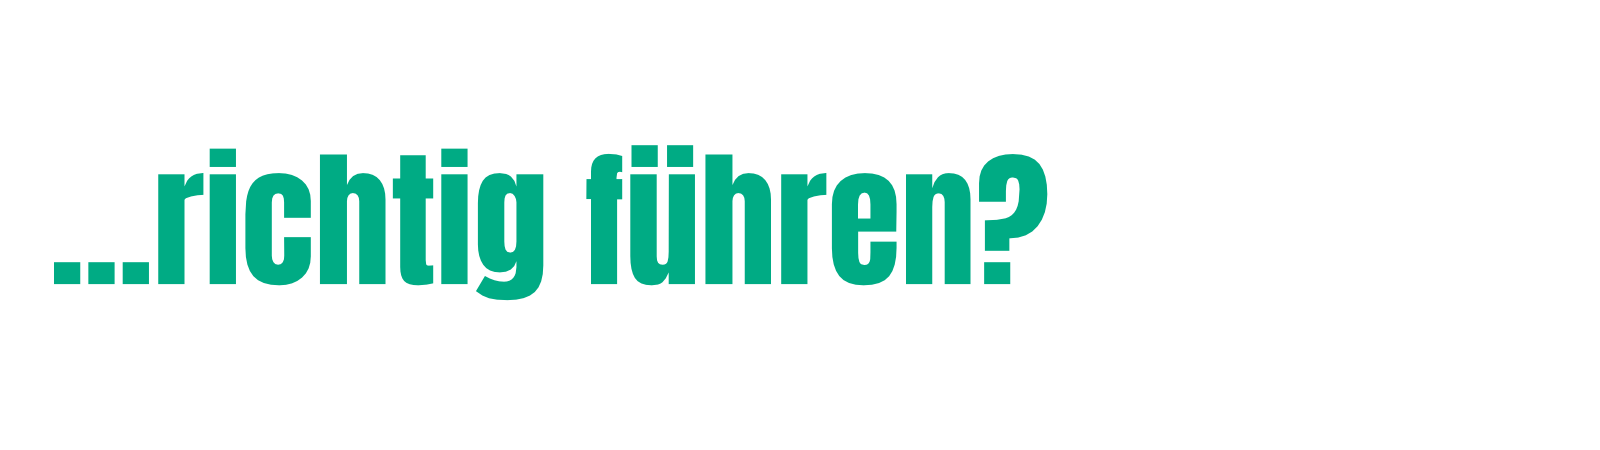 fuehrung-slider-low-green.png